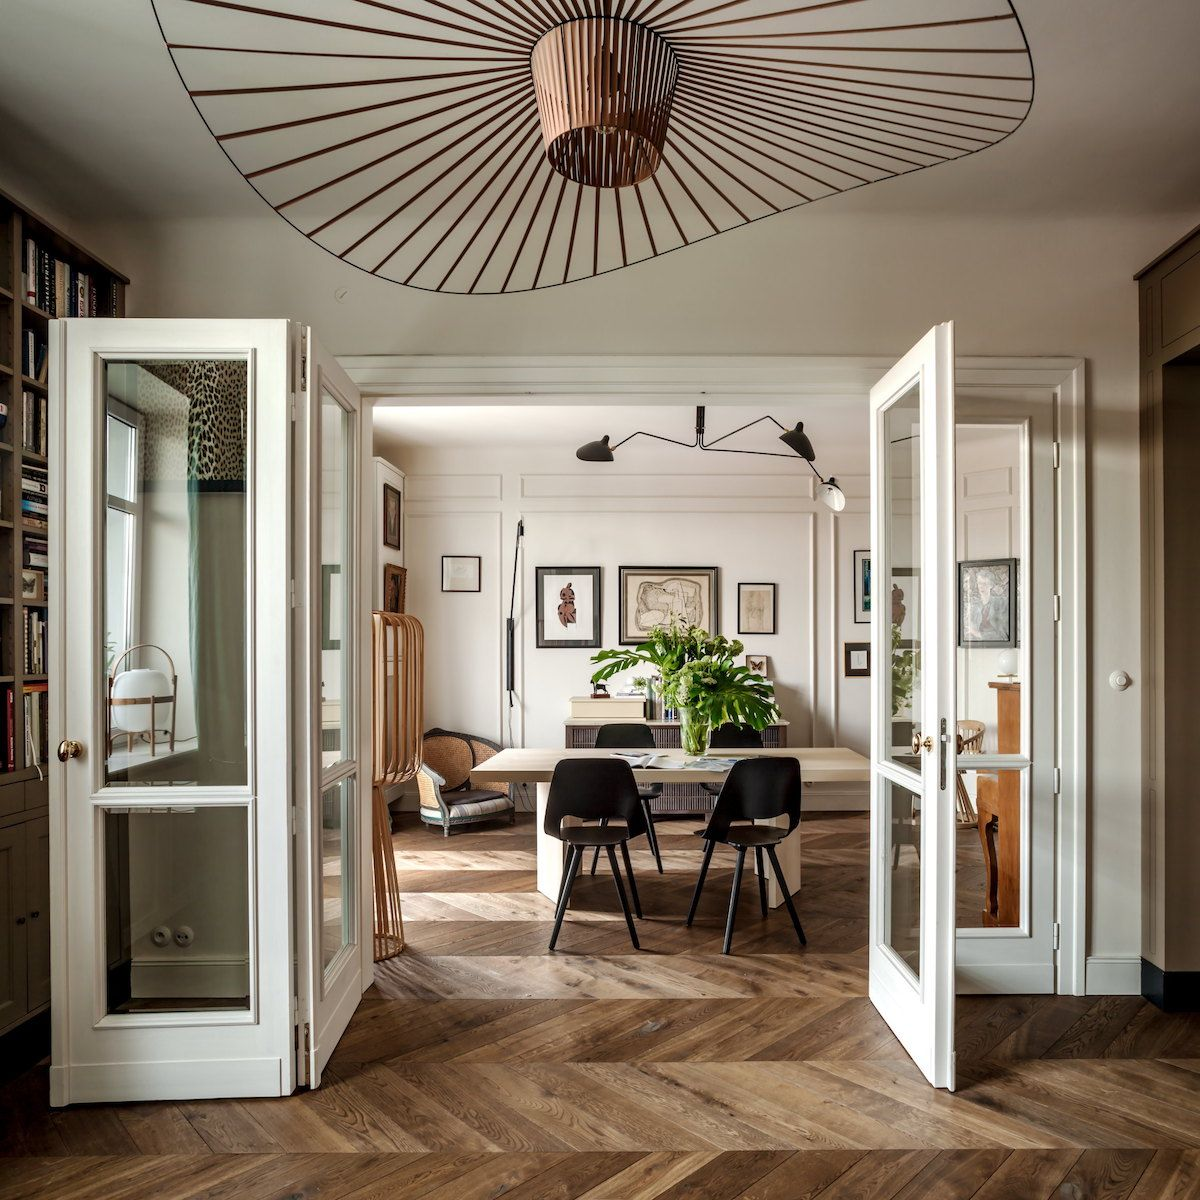 Appartamento in stile francese a Varsavia Foto Living